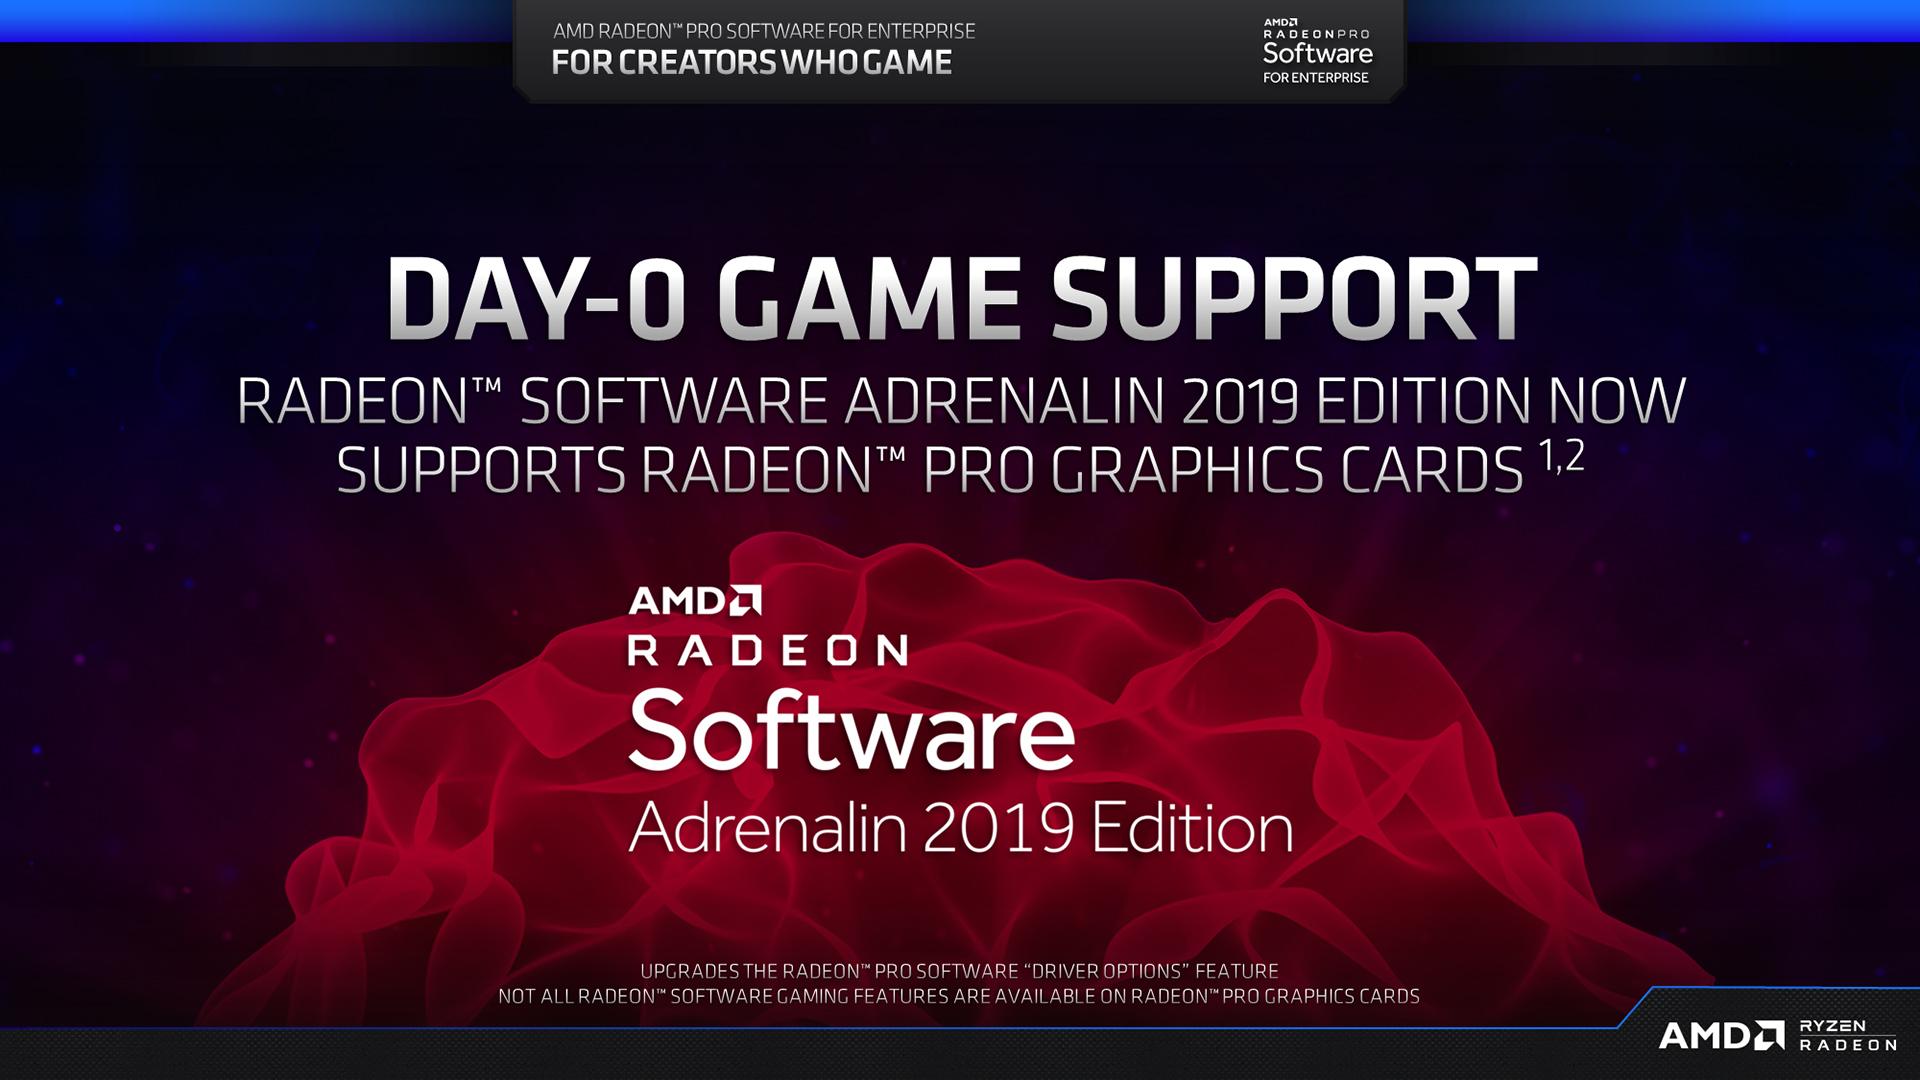 AMD Releases Radeon Pro Software for Enterprise 19 Q2